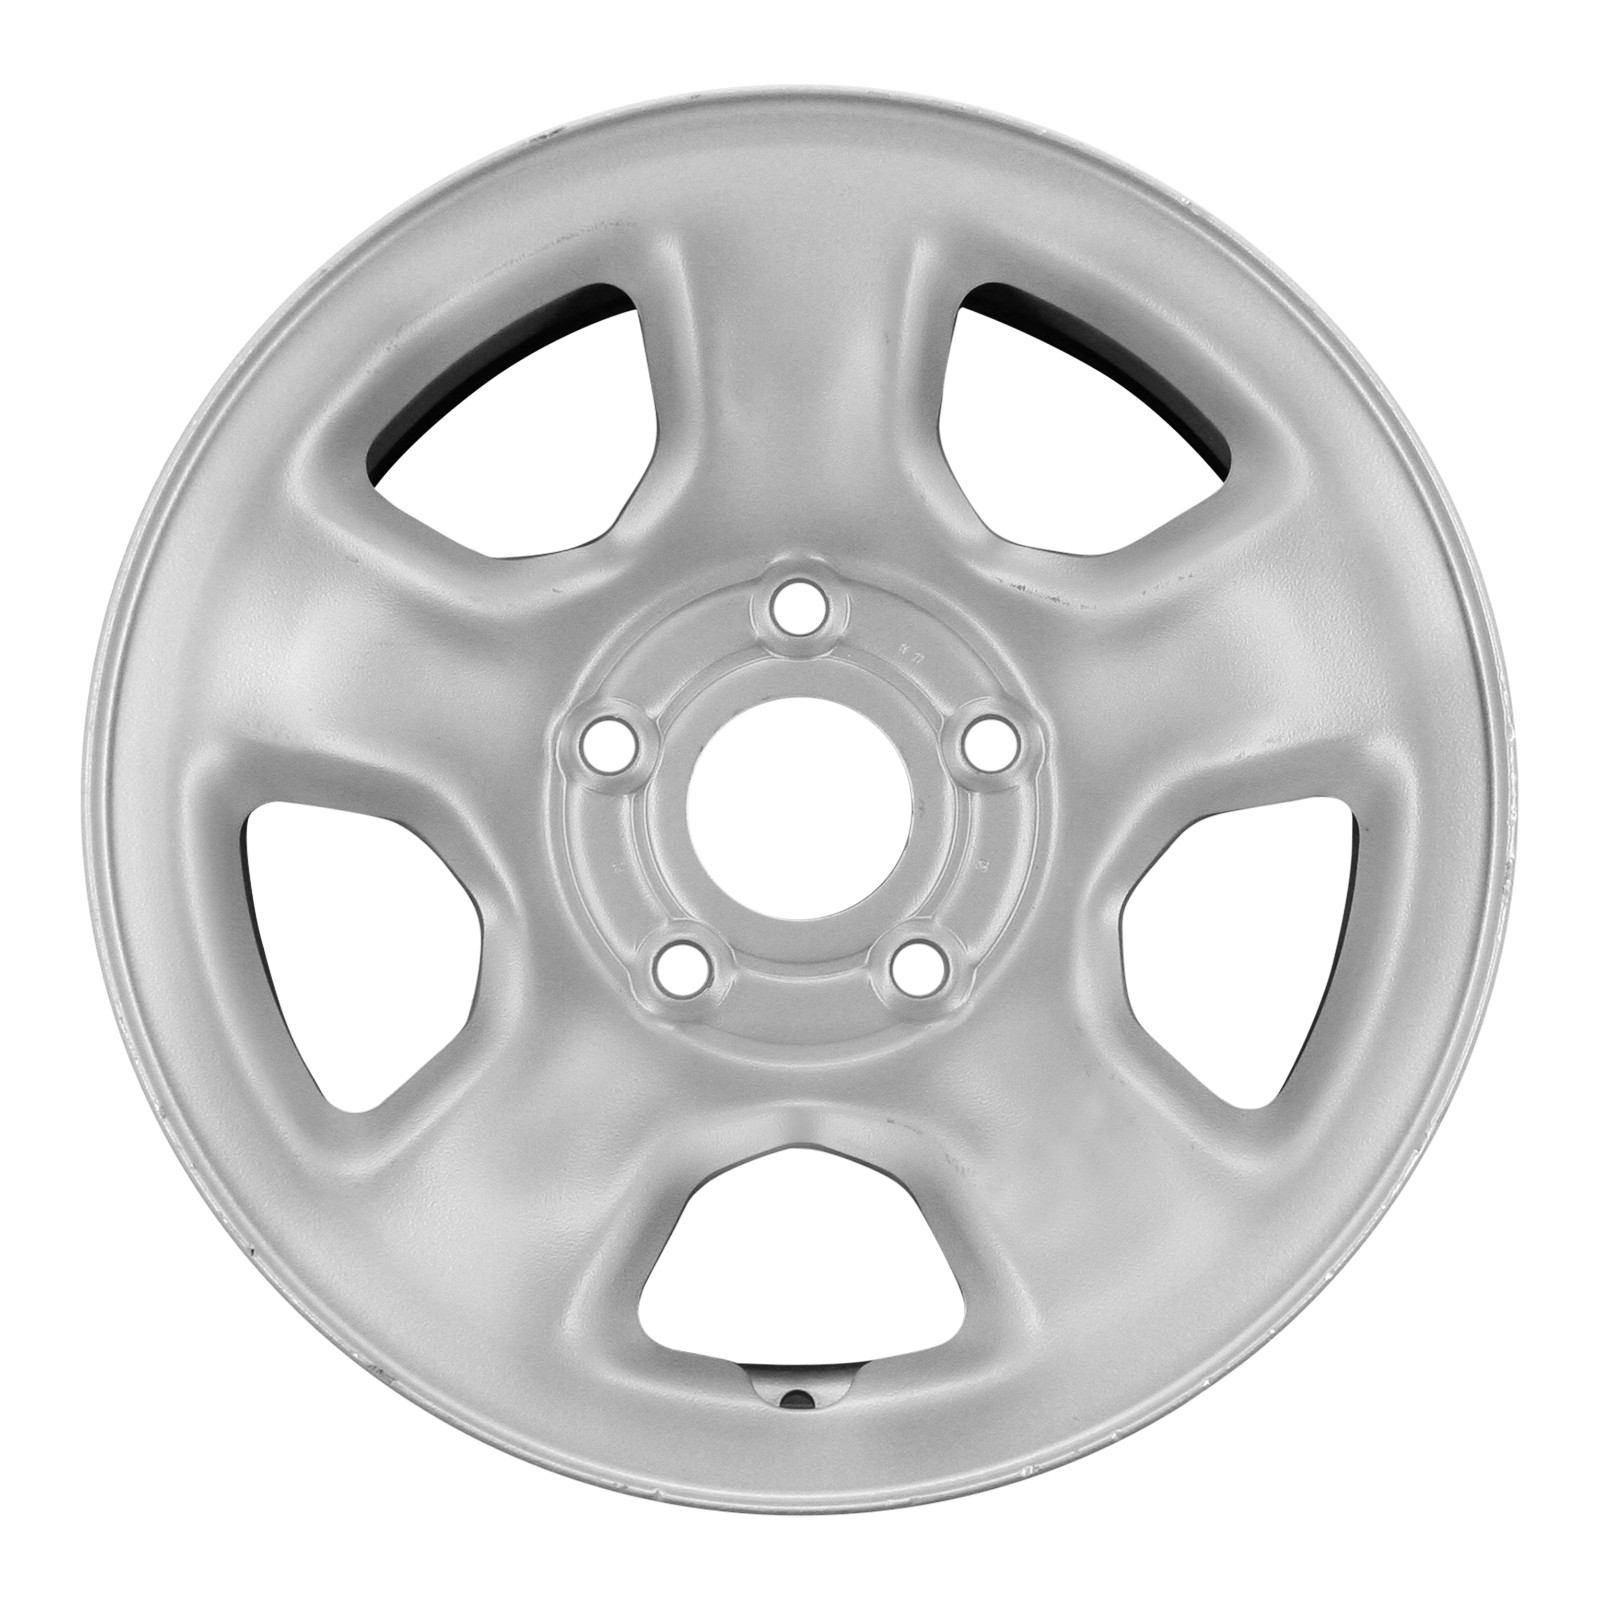 Wheel on 2001 Dodge Ram 3500